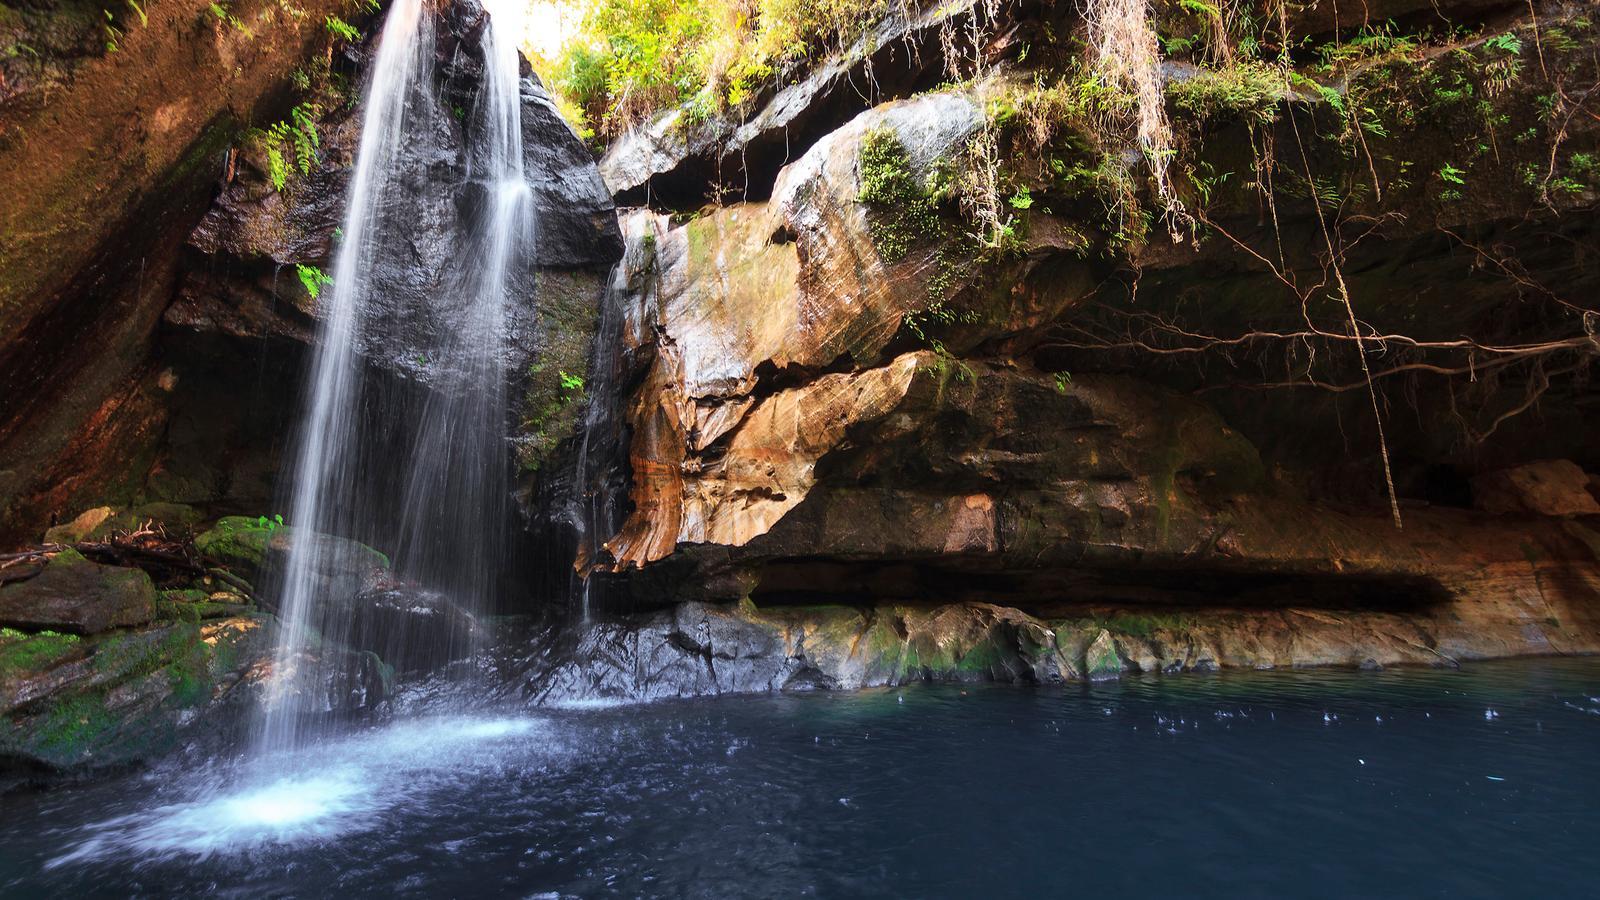 traveljunkies Madagaskar Abenteurreise Rundreise Wasserfall Afrika Gruppenreise Erlebnisreise